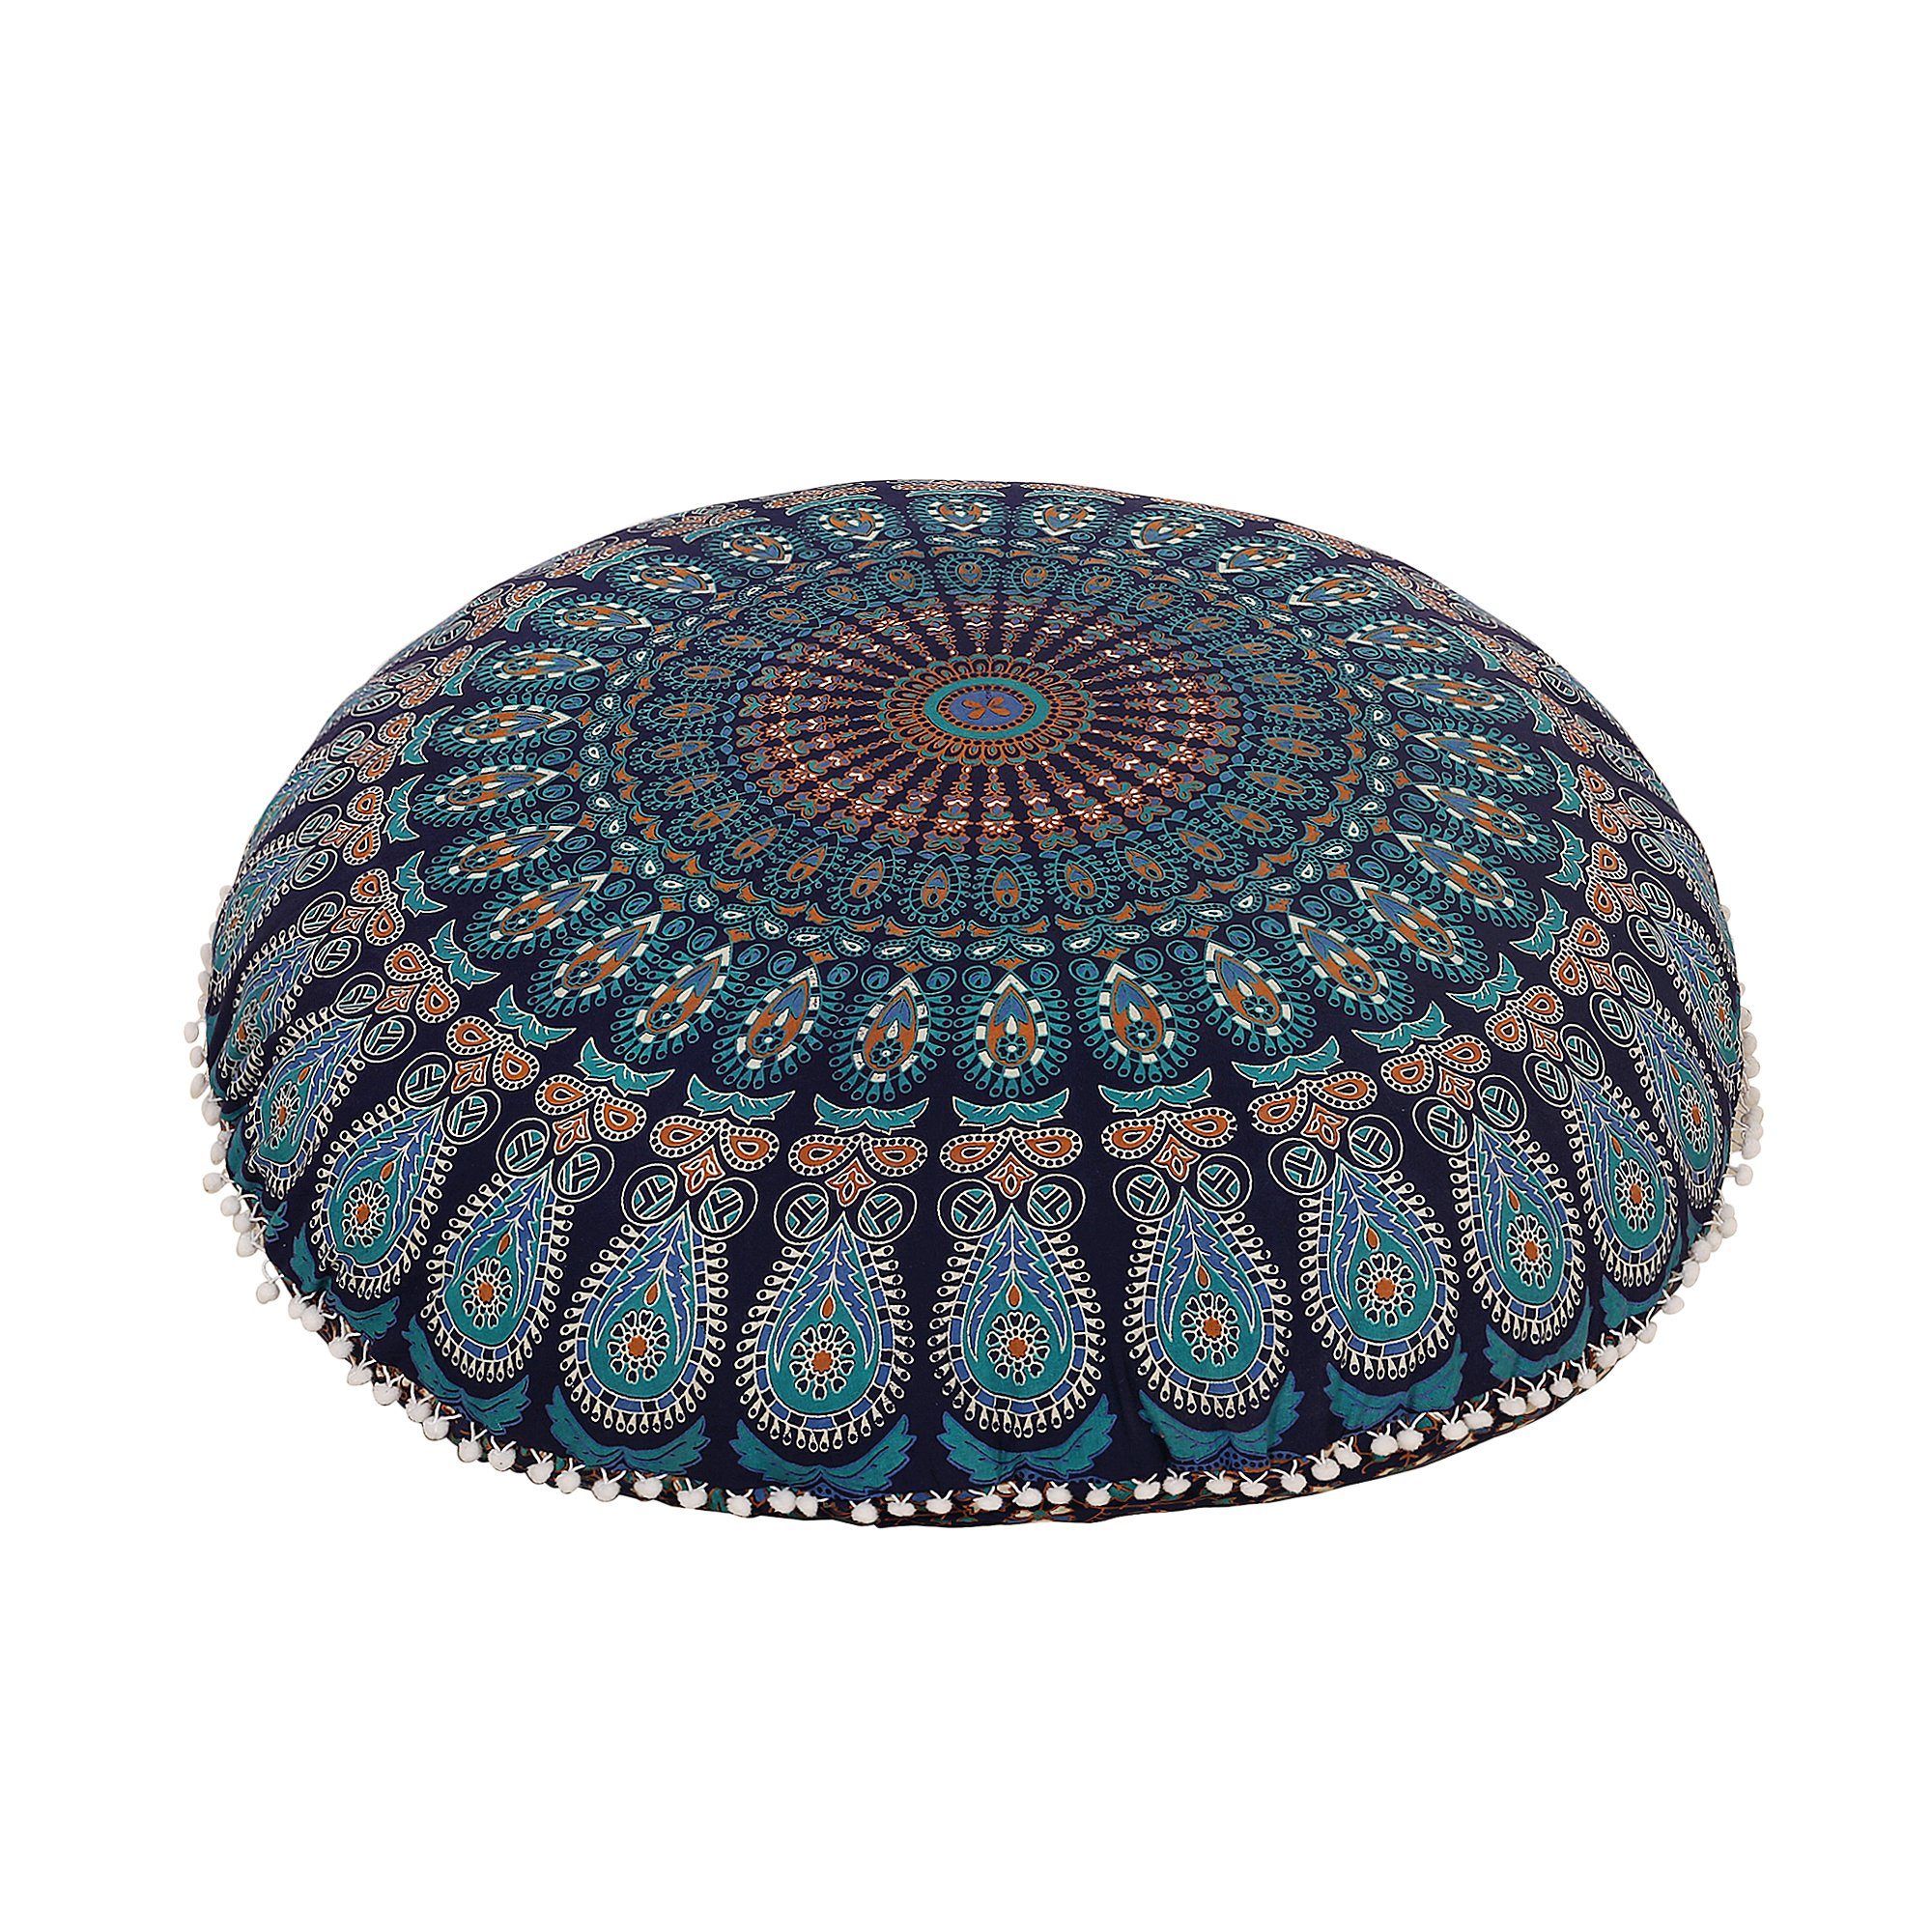 32'' BLUE MANDALA FLOOR PILLOW CUSHION SEATING THROW COVER HIPPIE DECORATIVE Bohemian Ottoman Poufs, Pom Pom Pillow Cases,Boho Indian